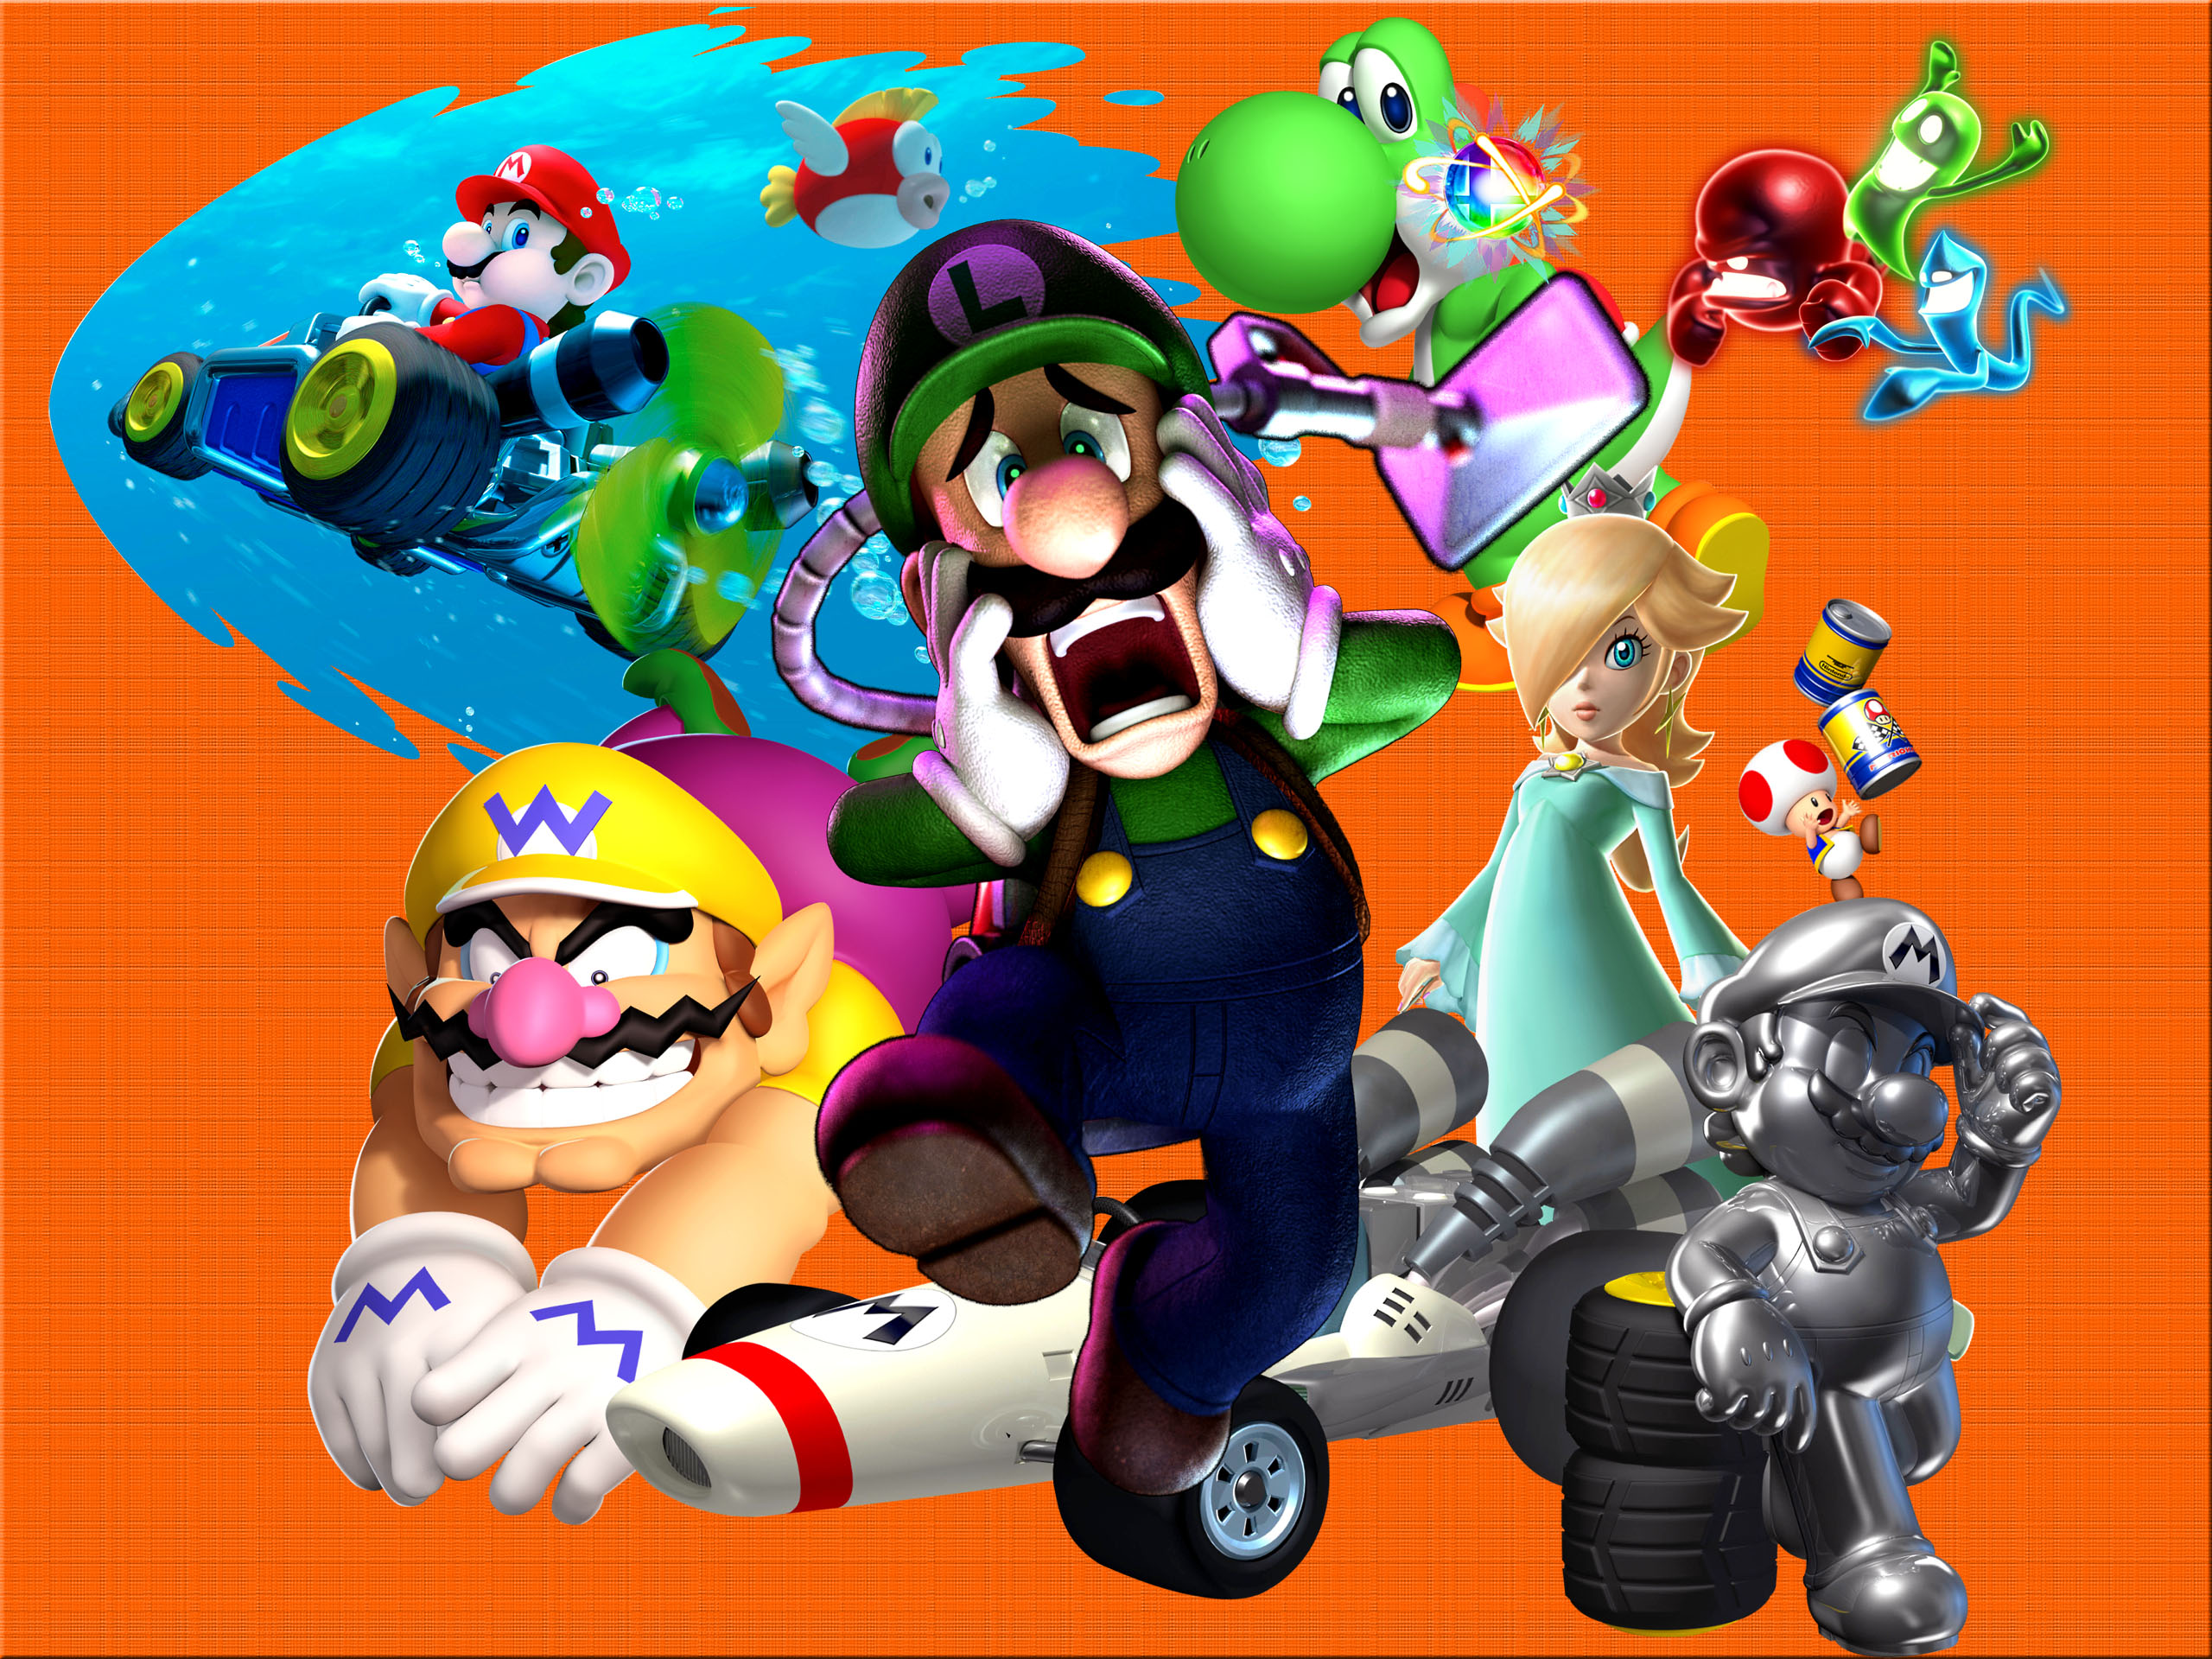 Inspirational Quotes Wallpaper Download Super Mario Hd Backgrounds Pixelstalk Net